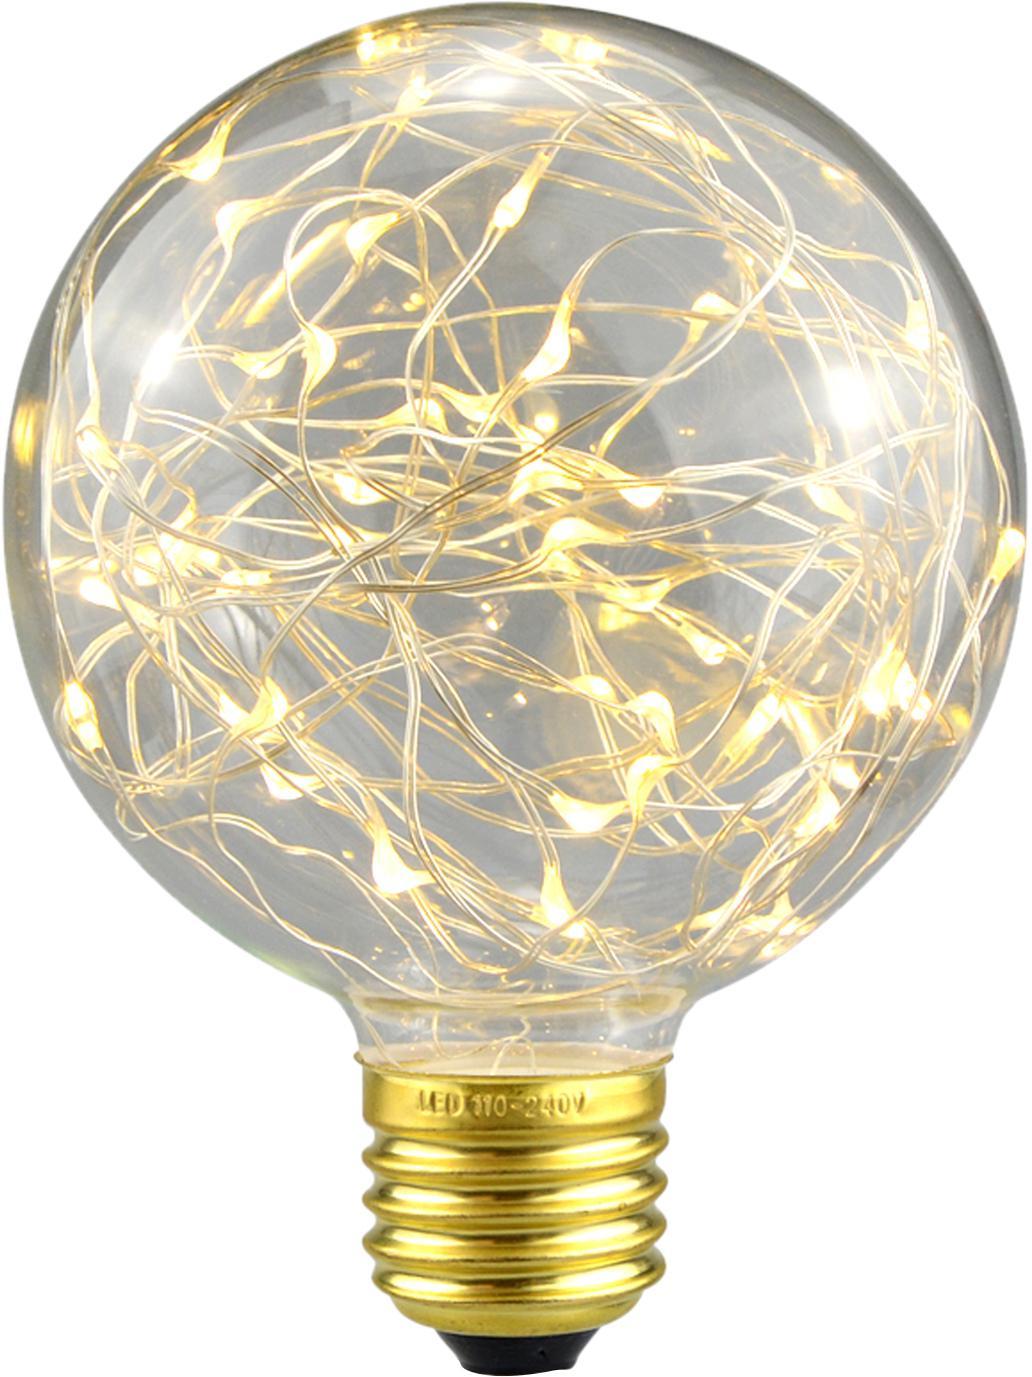 Лампа светодиодная Rev ritter Vintage copper wire шар (32444 7)